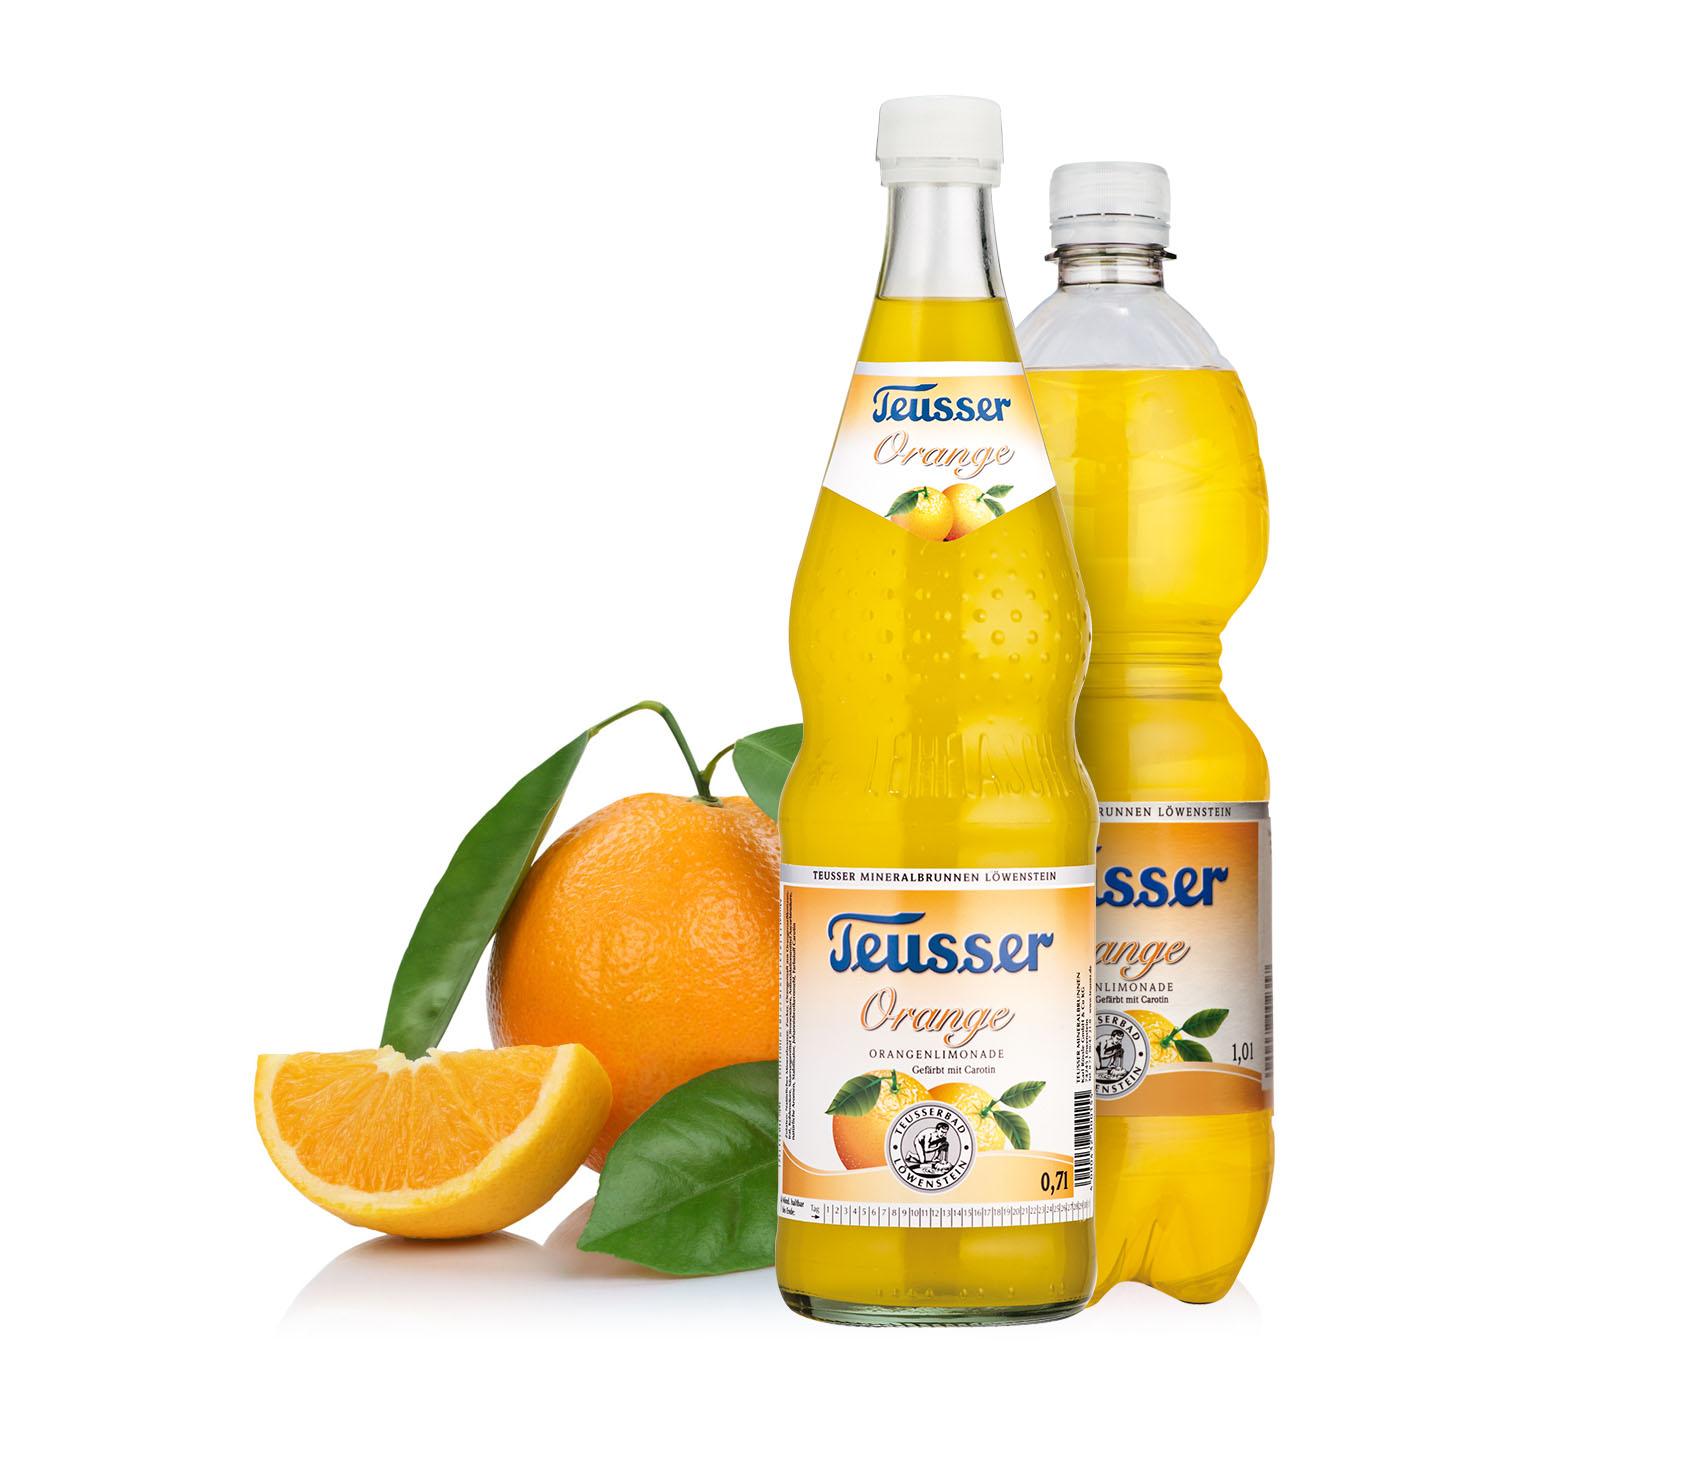 Teusser Orange